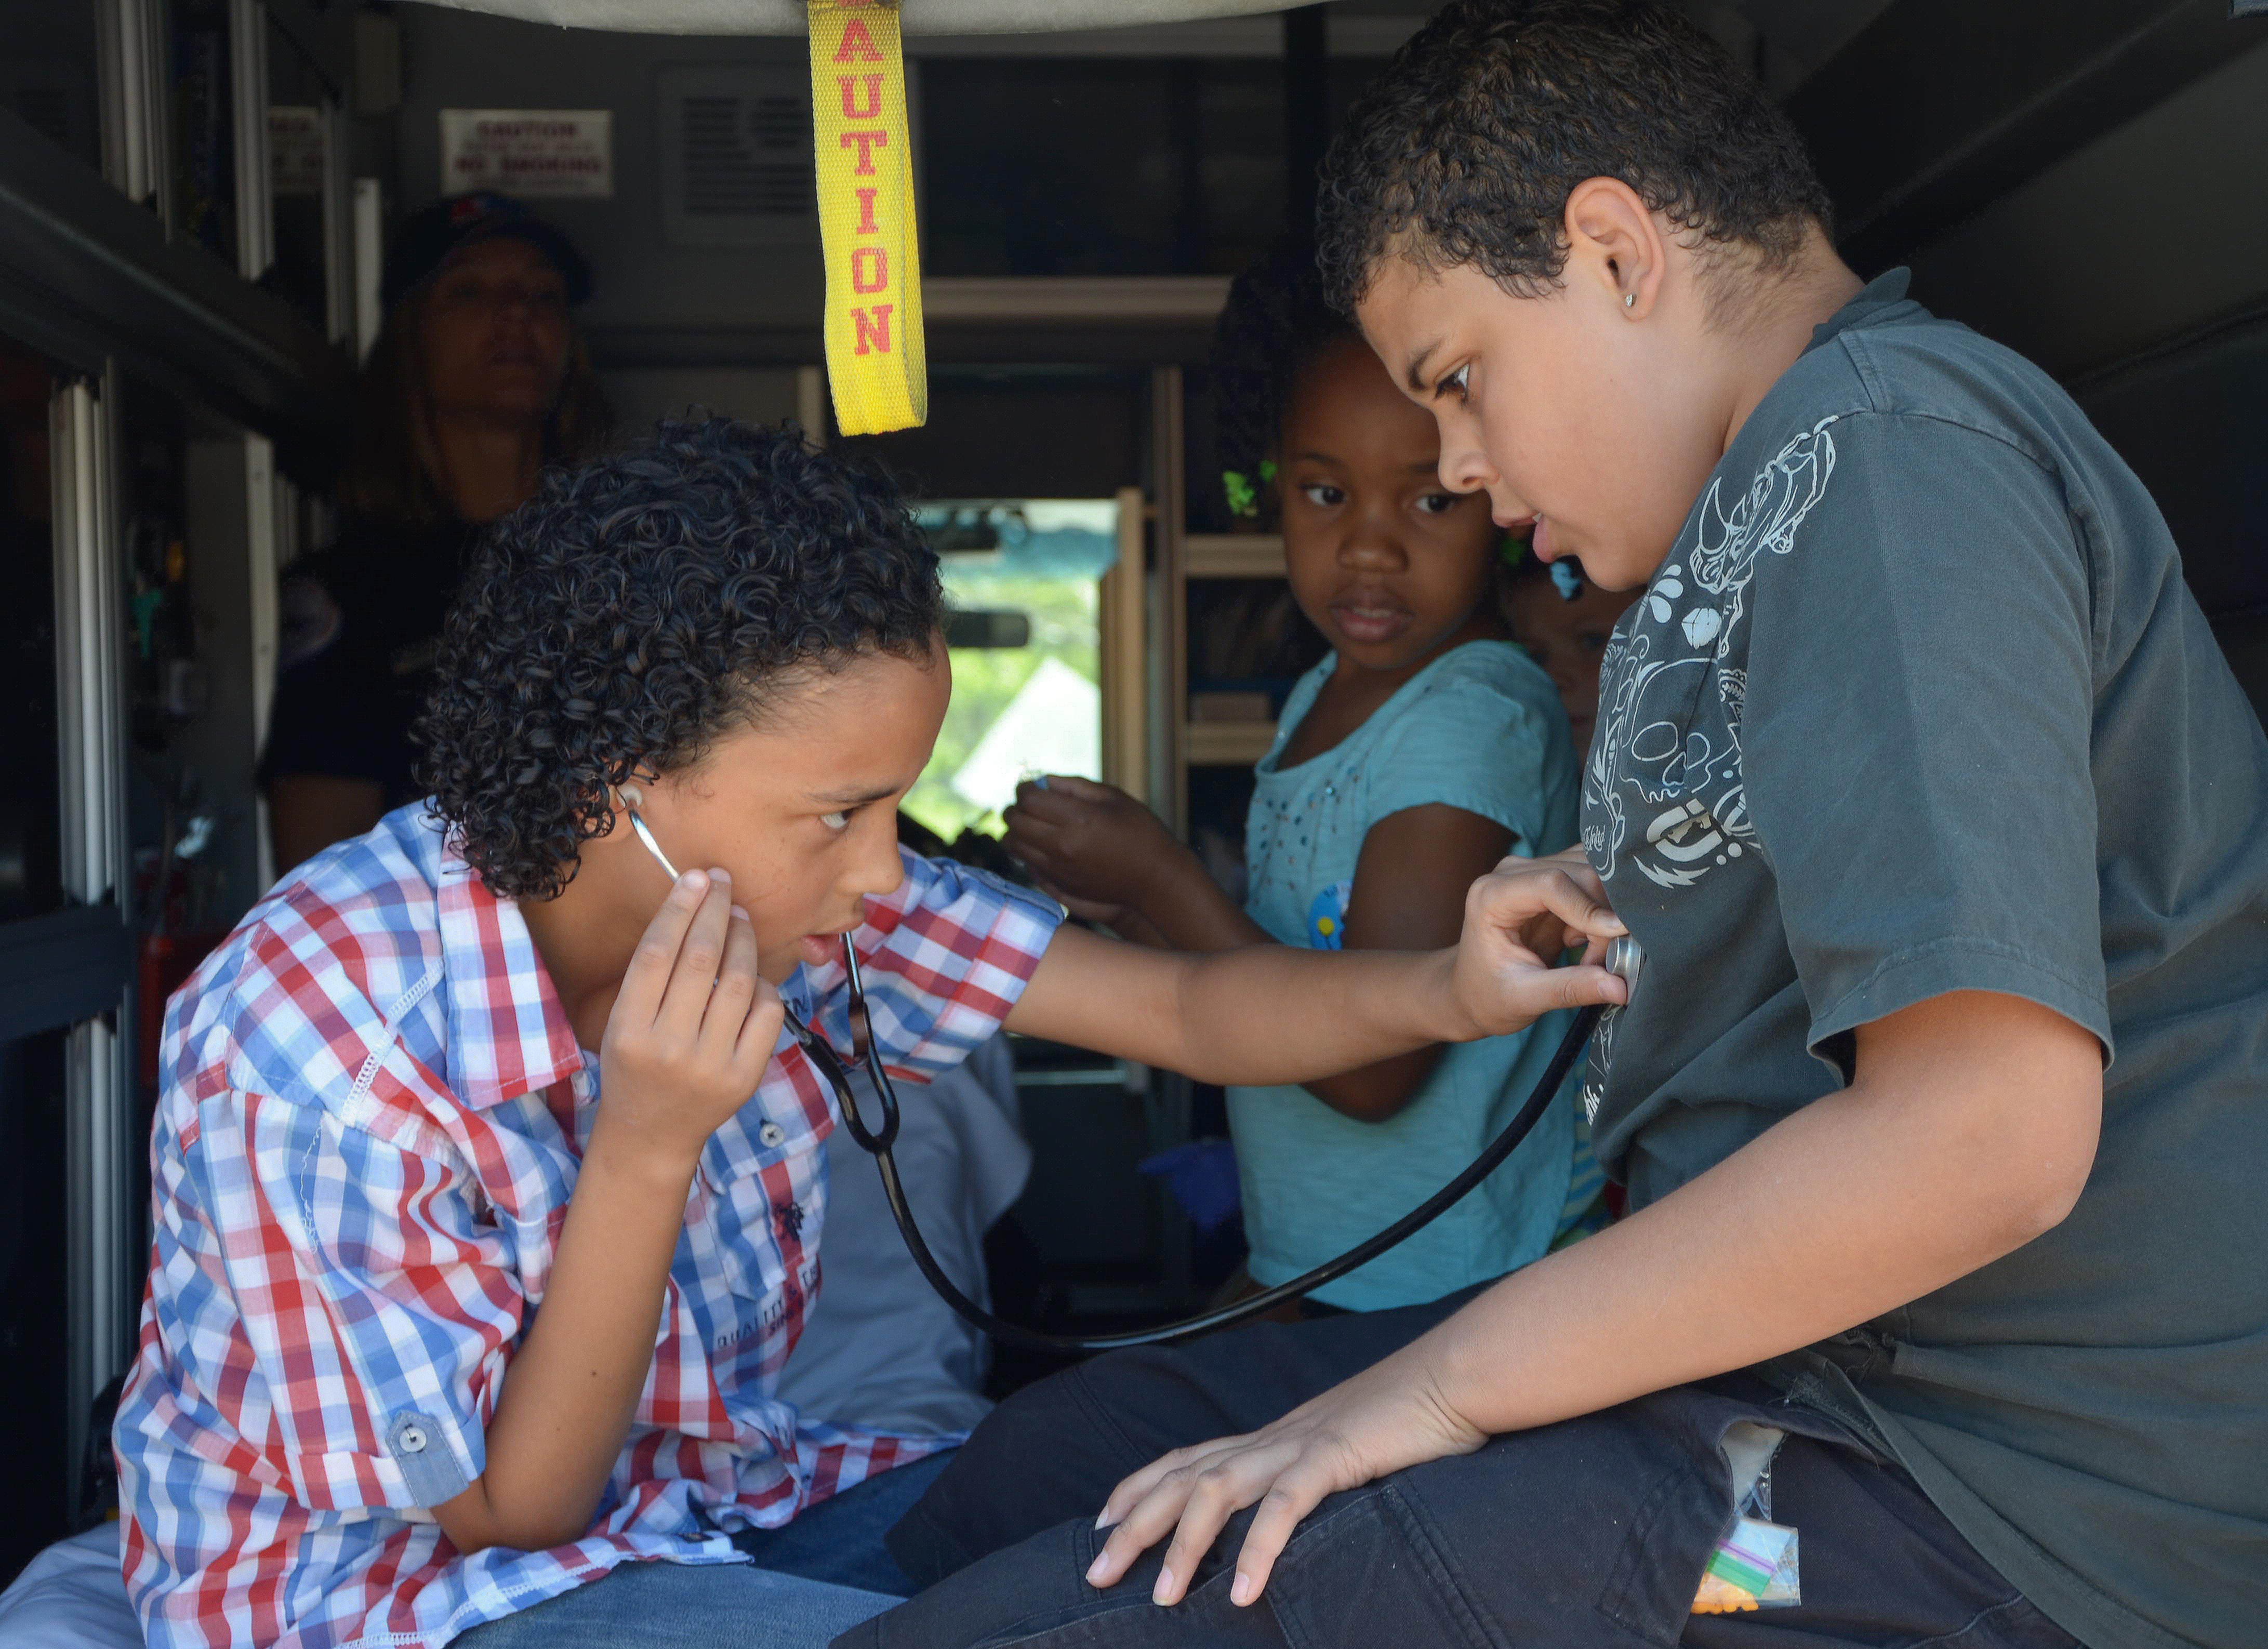 Photo: Katrina Haselgren, Dimitri Haselgren, Elijah Jones, kids in poverty, stress and the brain